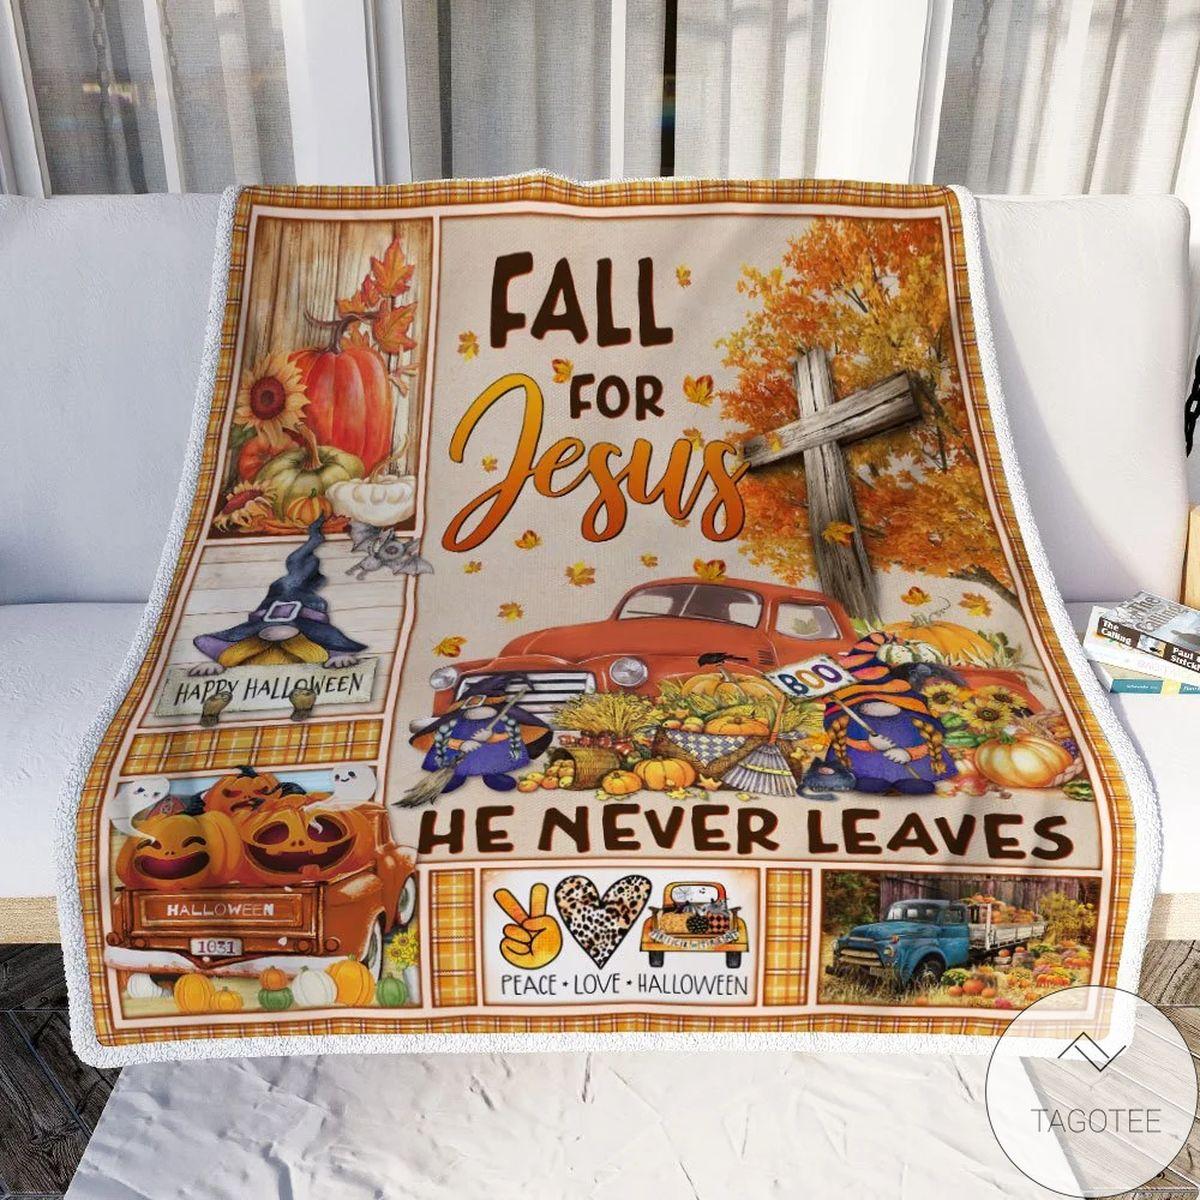 Fall For Jesus He Never Leave Halloween Truck Sofa Throw Blanket